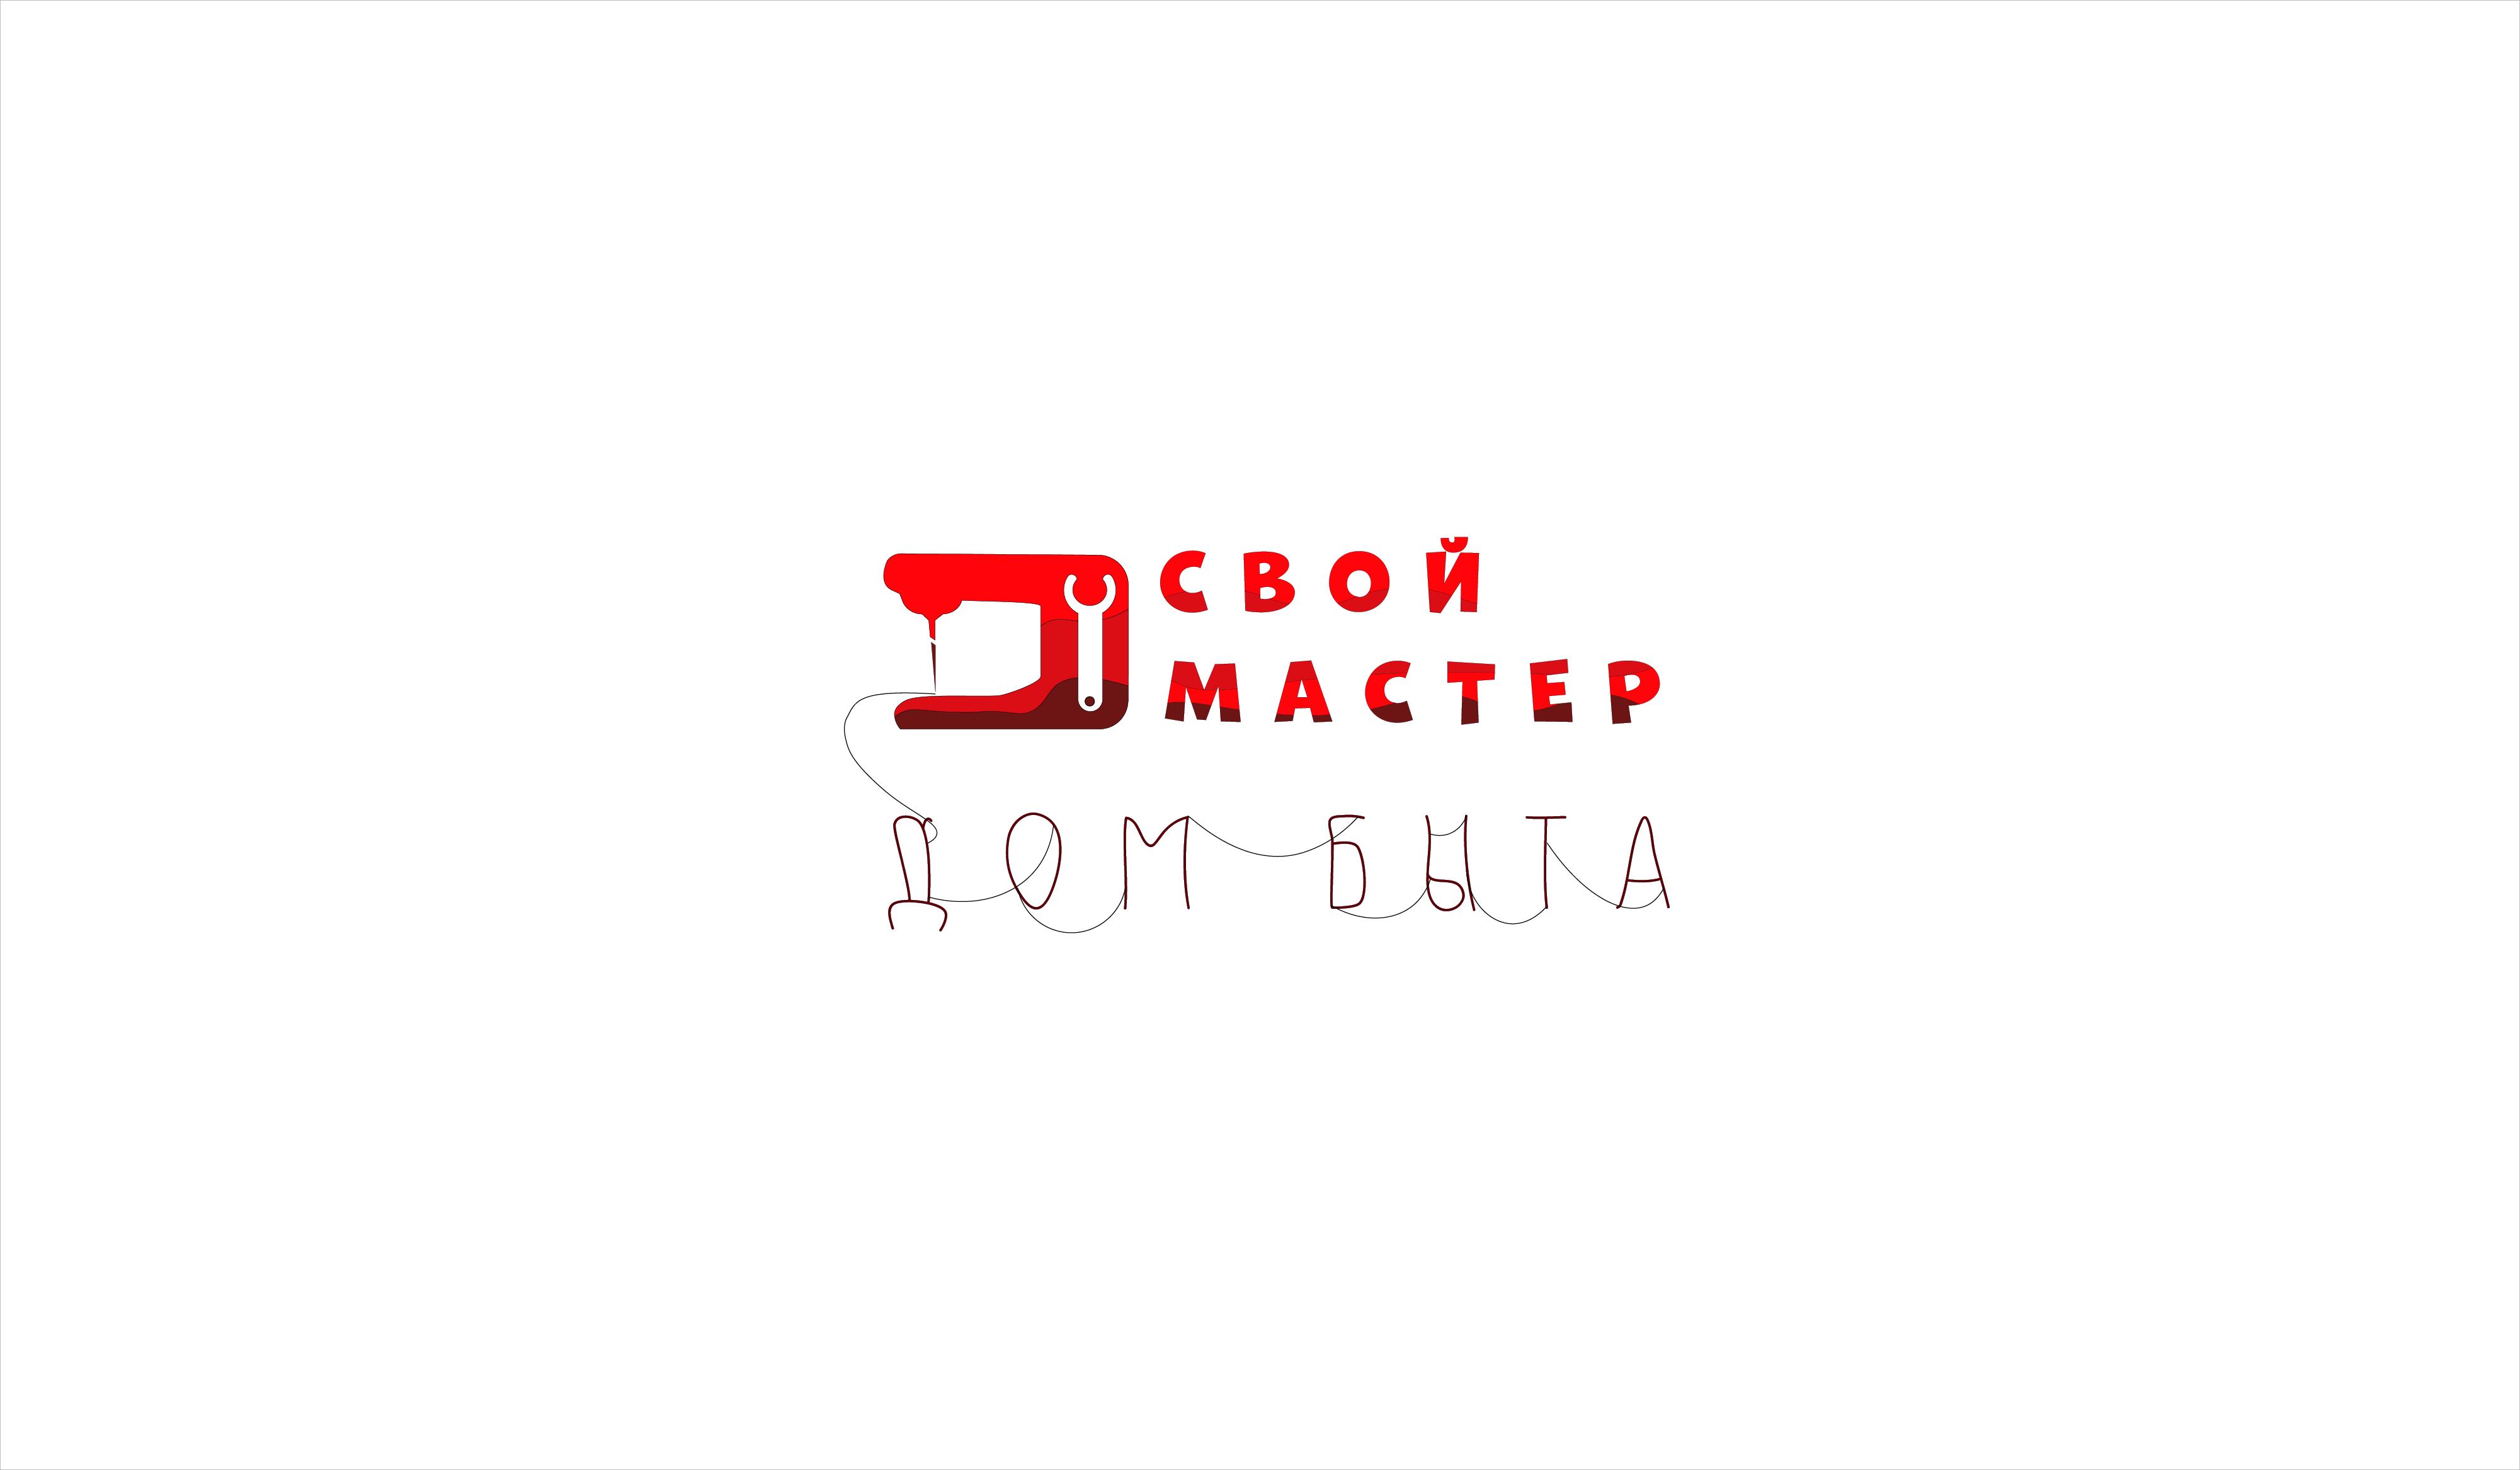 Логотип для сетевого ДОМ БЫТА фото f_9355d78d57fe4f5d.png